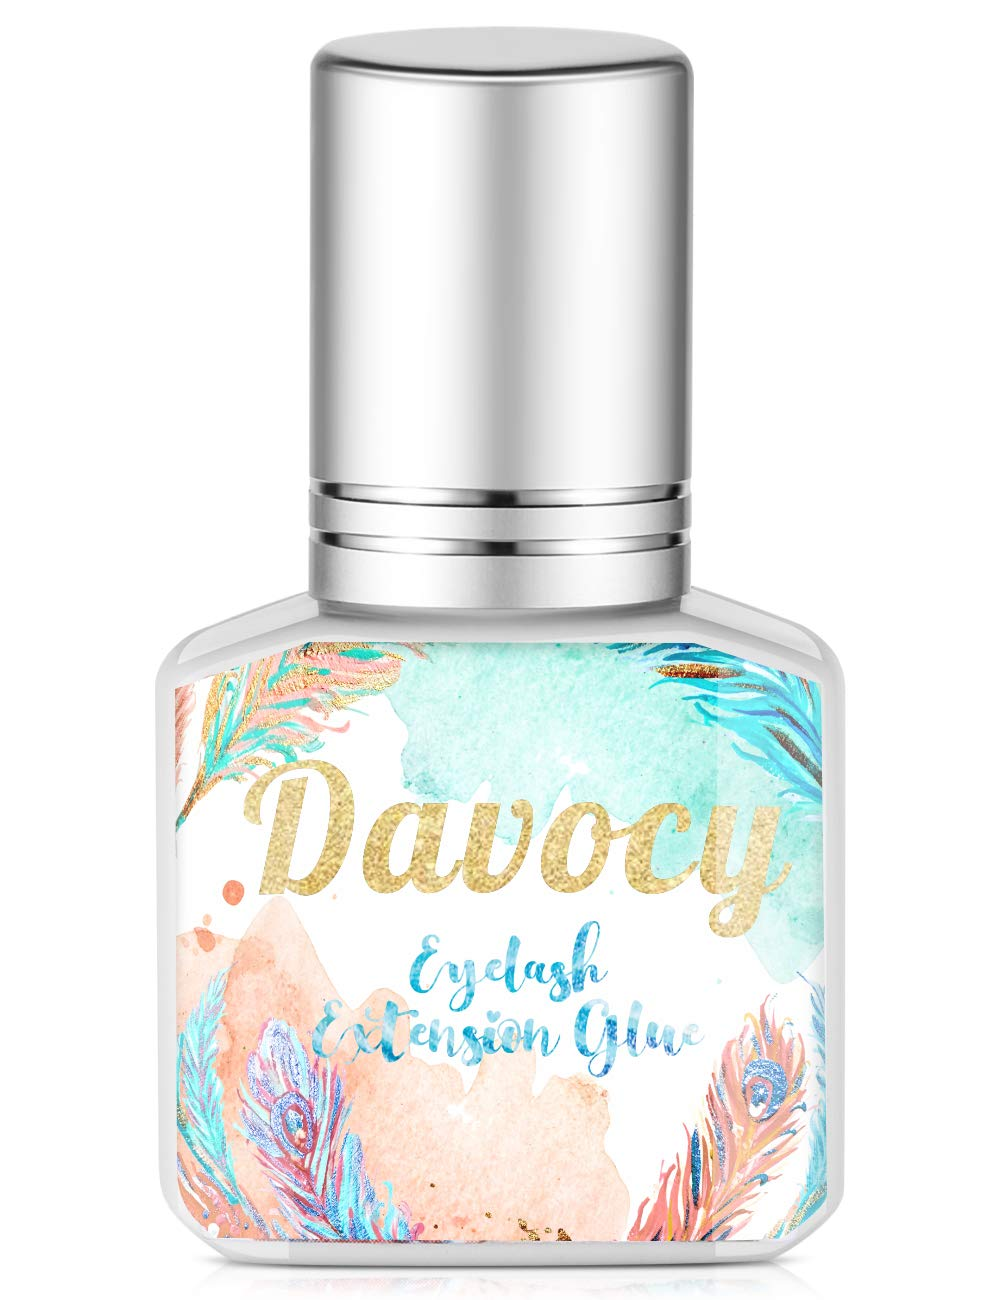 Davocy Eyelash Extension Glue - Best Eyelash Glue For Sensitive Eyes